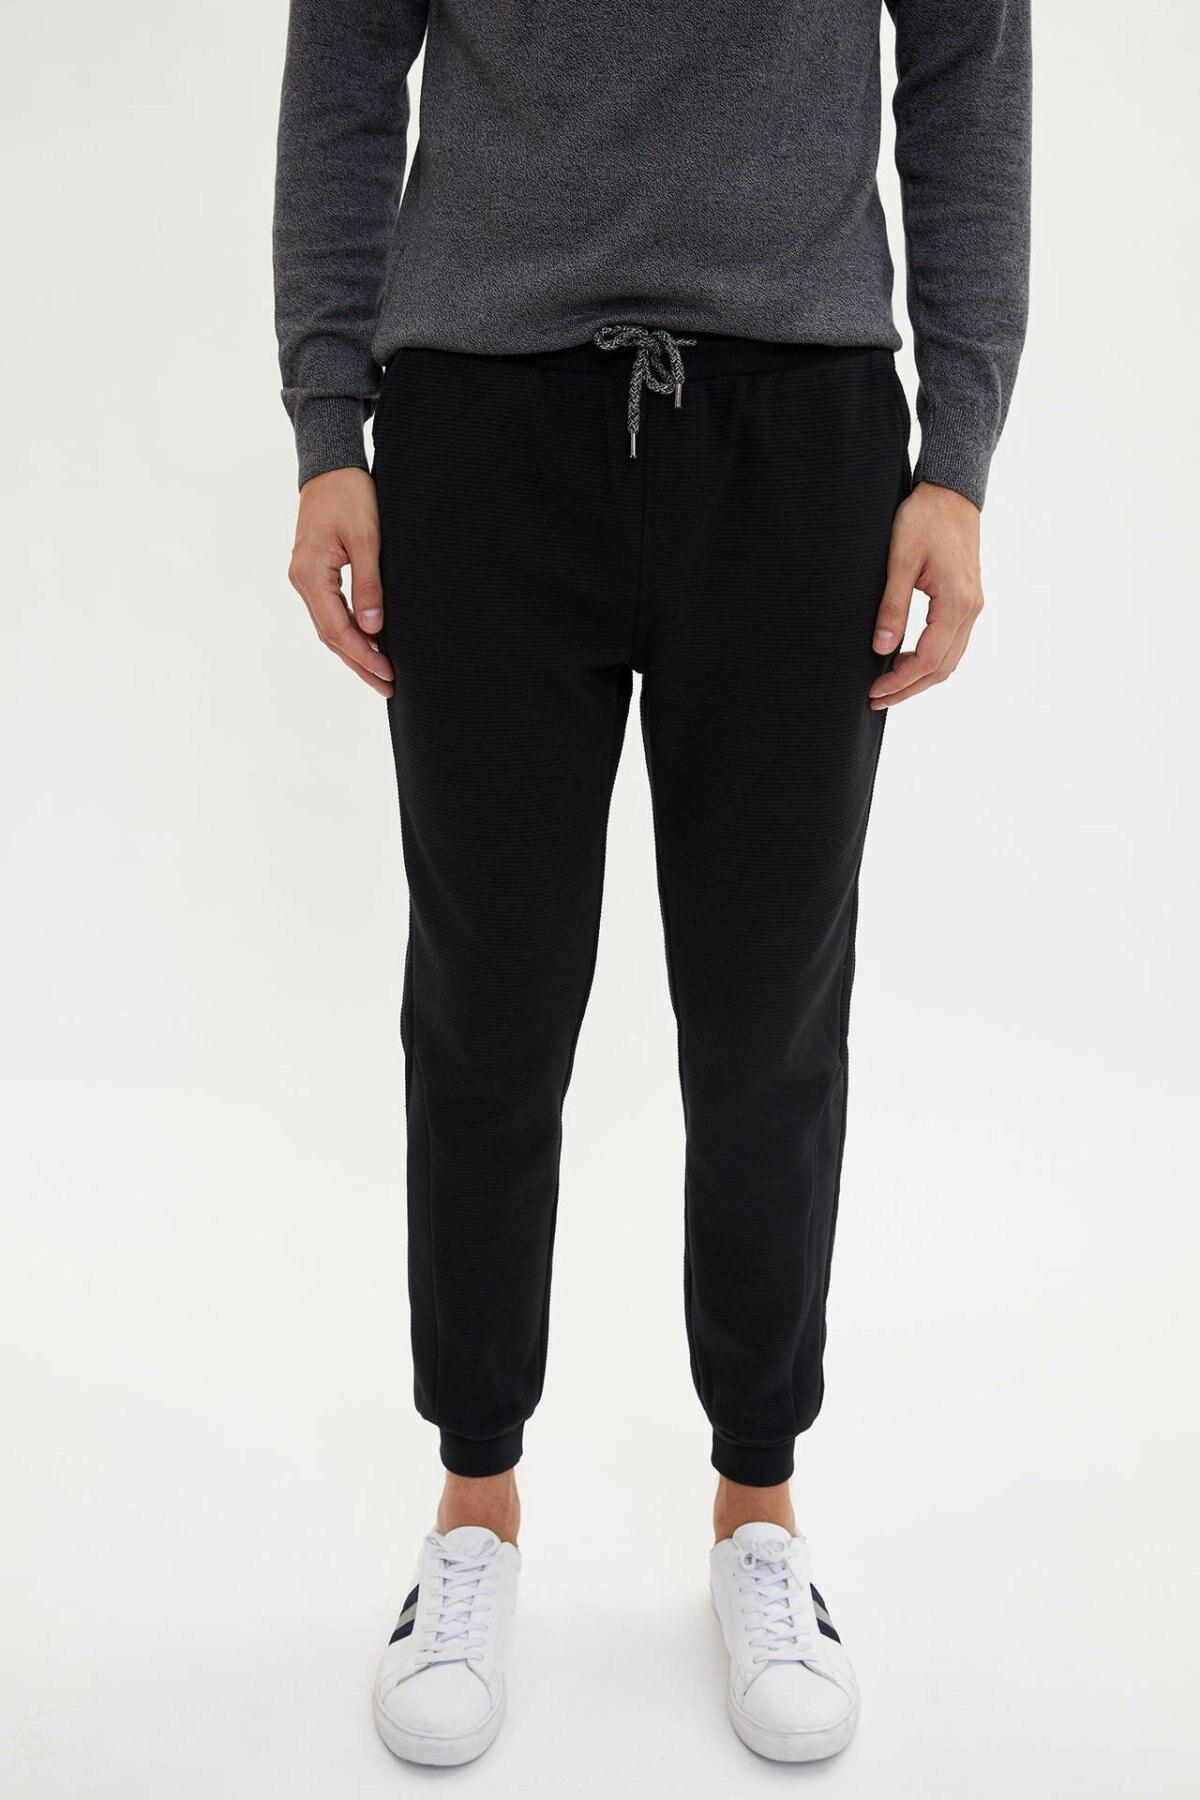 DeFacto Fashion Man Casual Drawstring Waist Trousers Male Sport Long Pants For Men's High Quality Sweatpants New - L5614AZ19AU